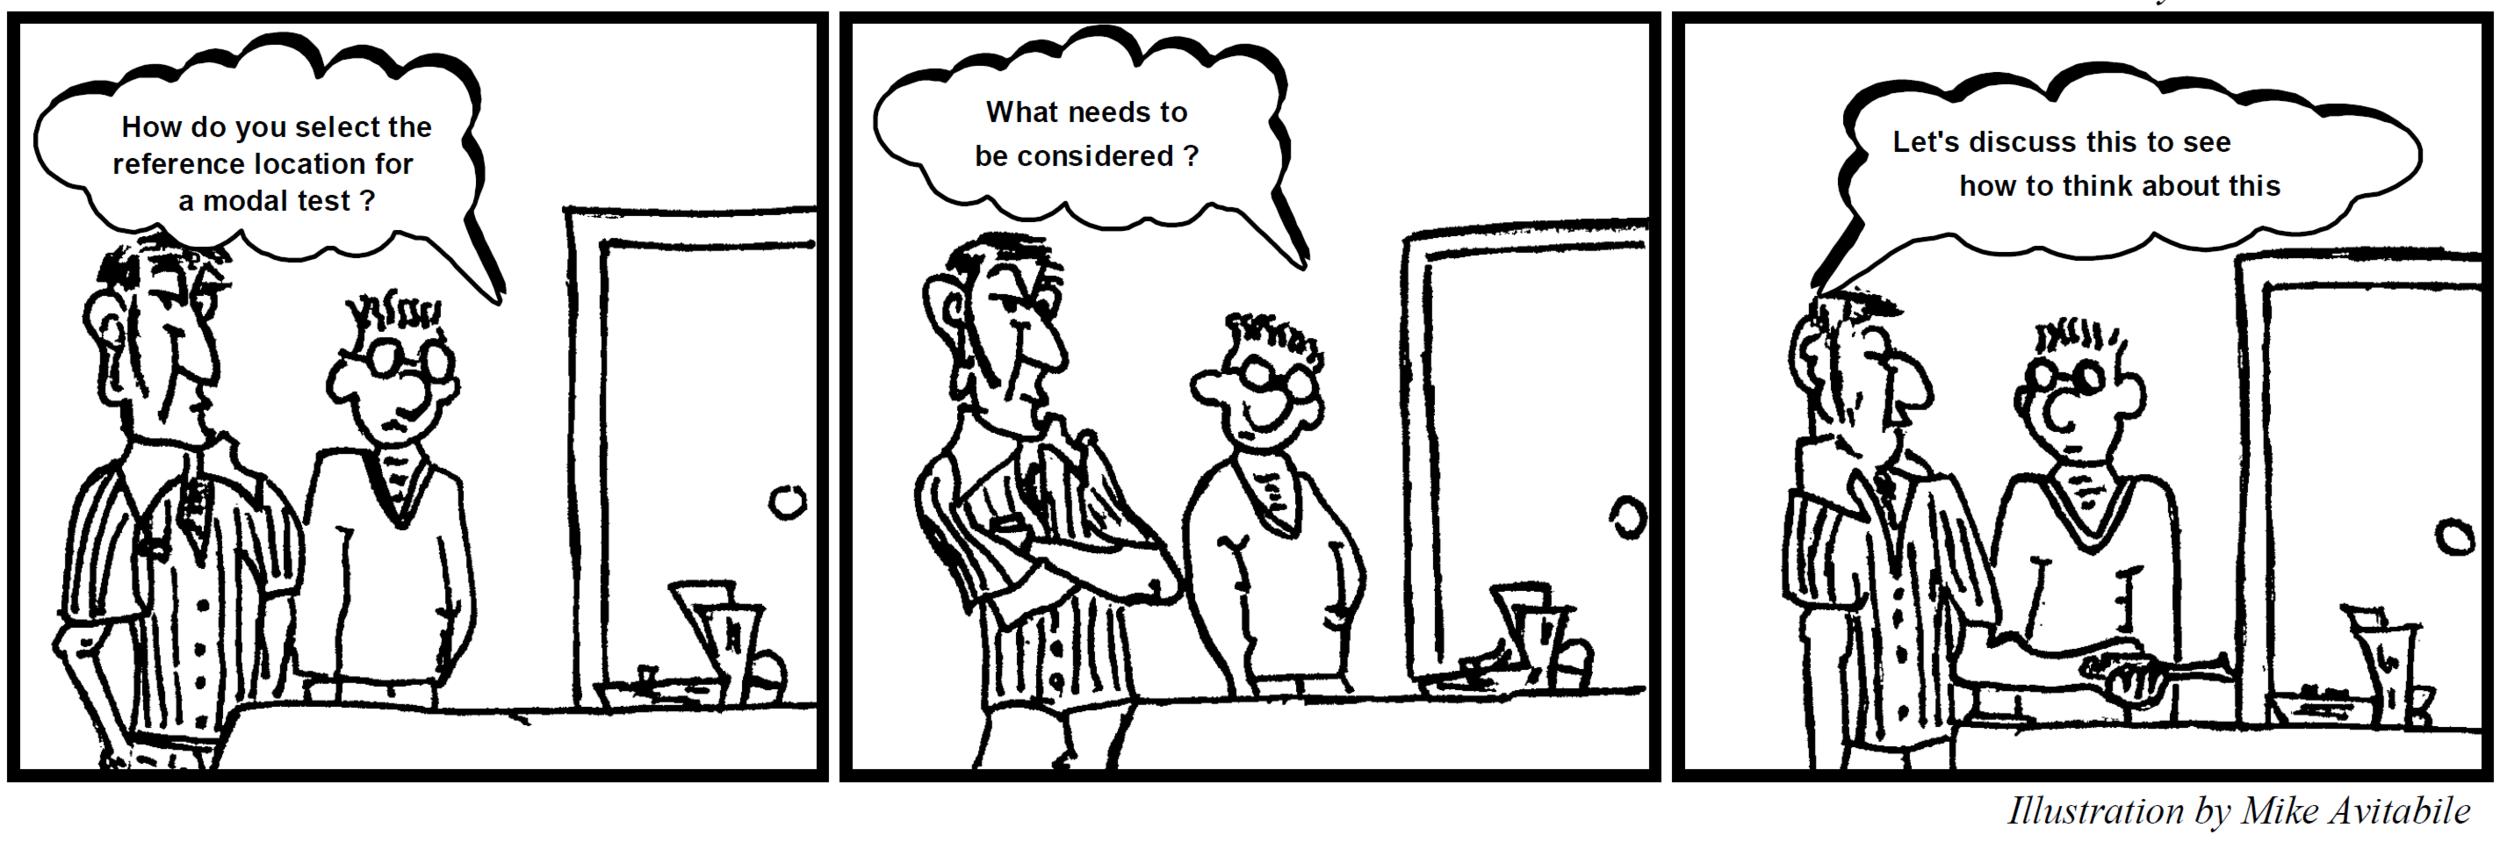 Modal comic.PNG